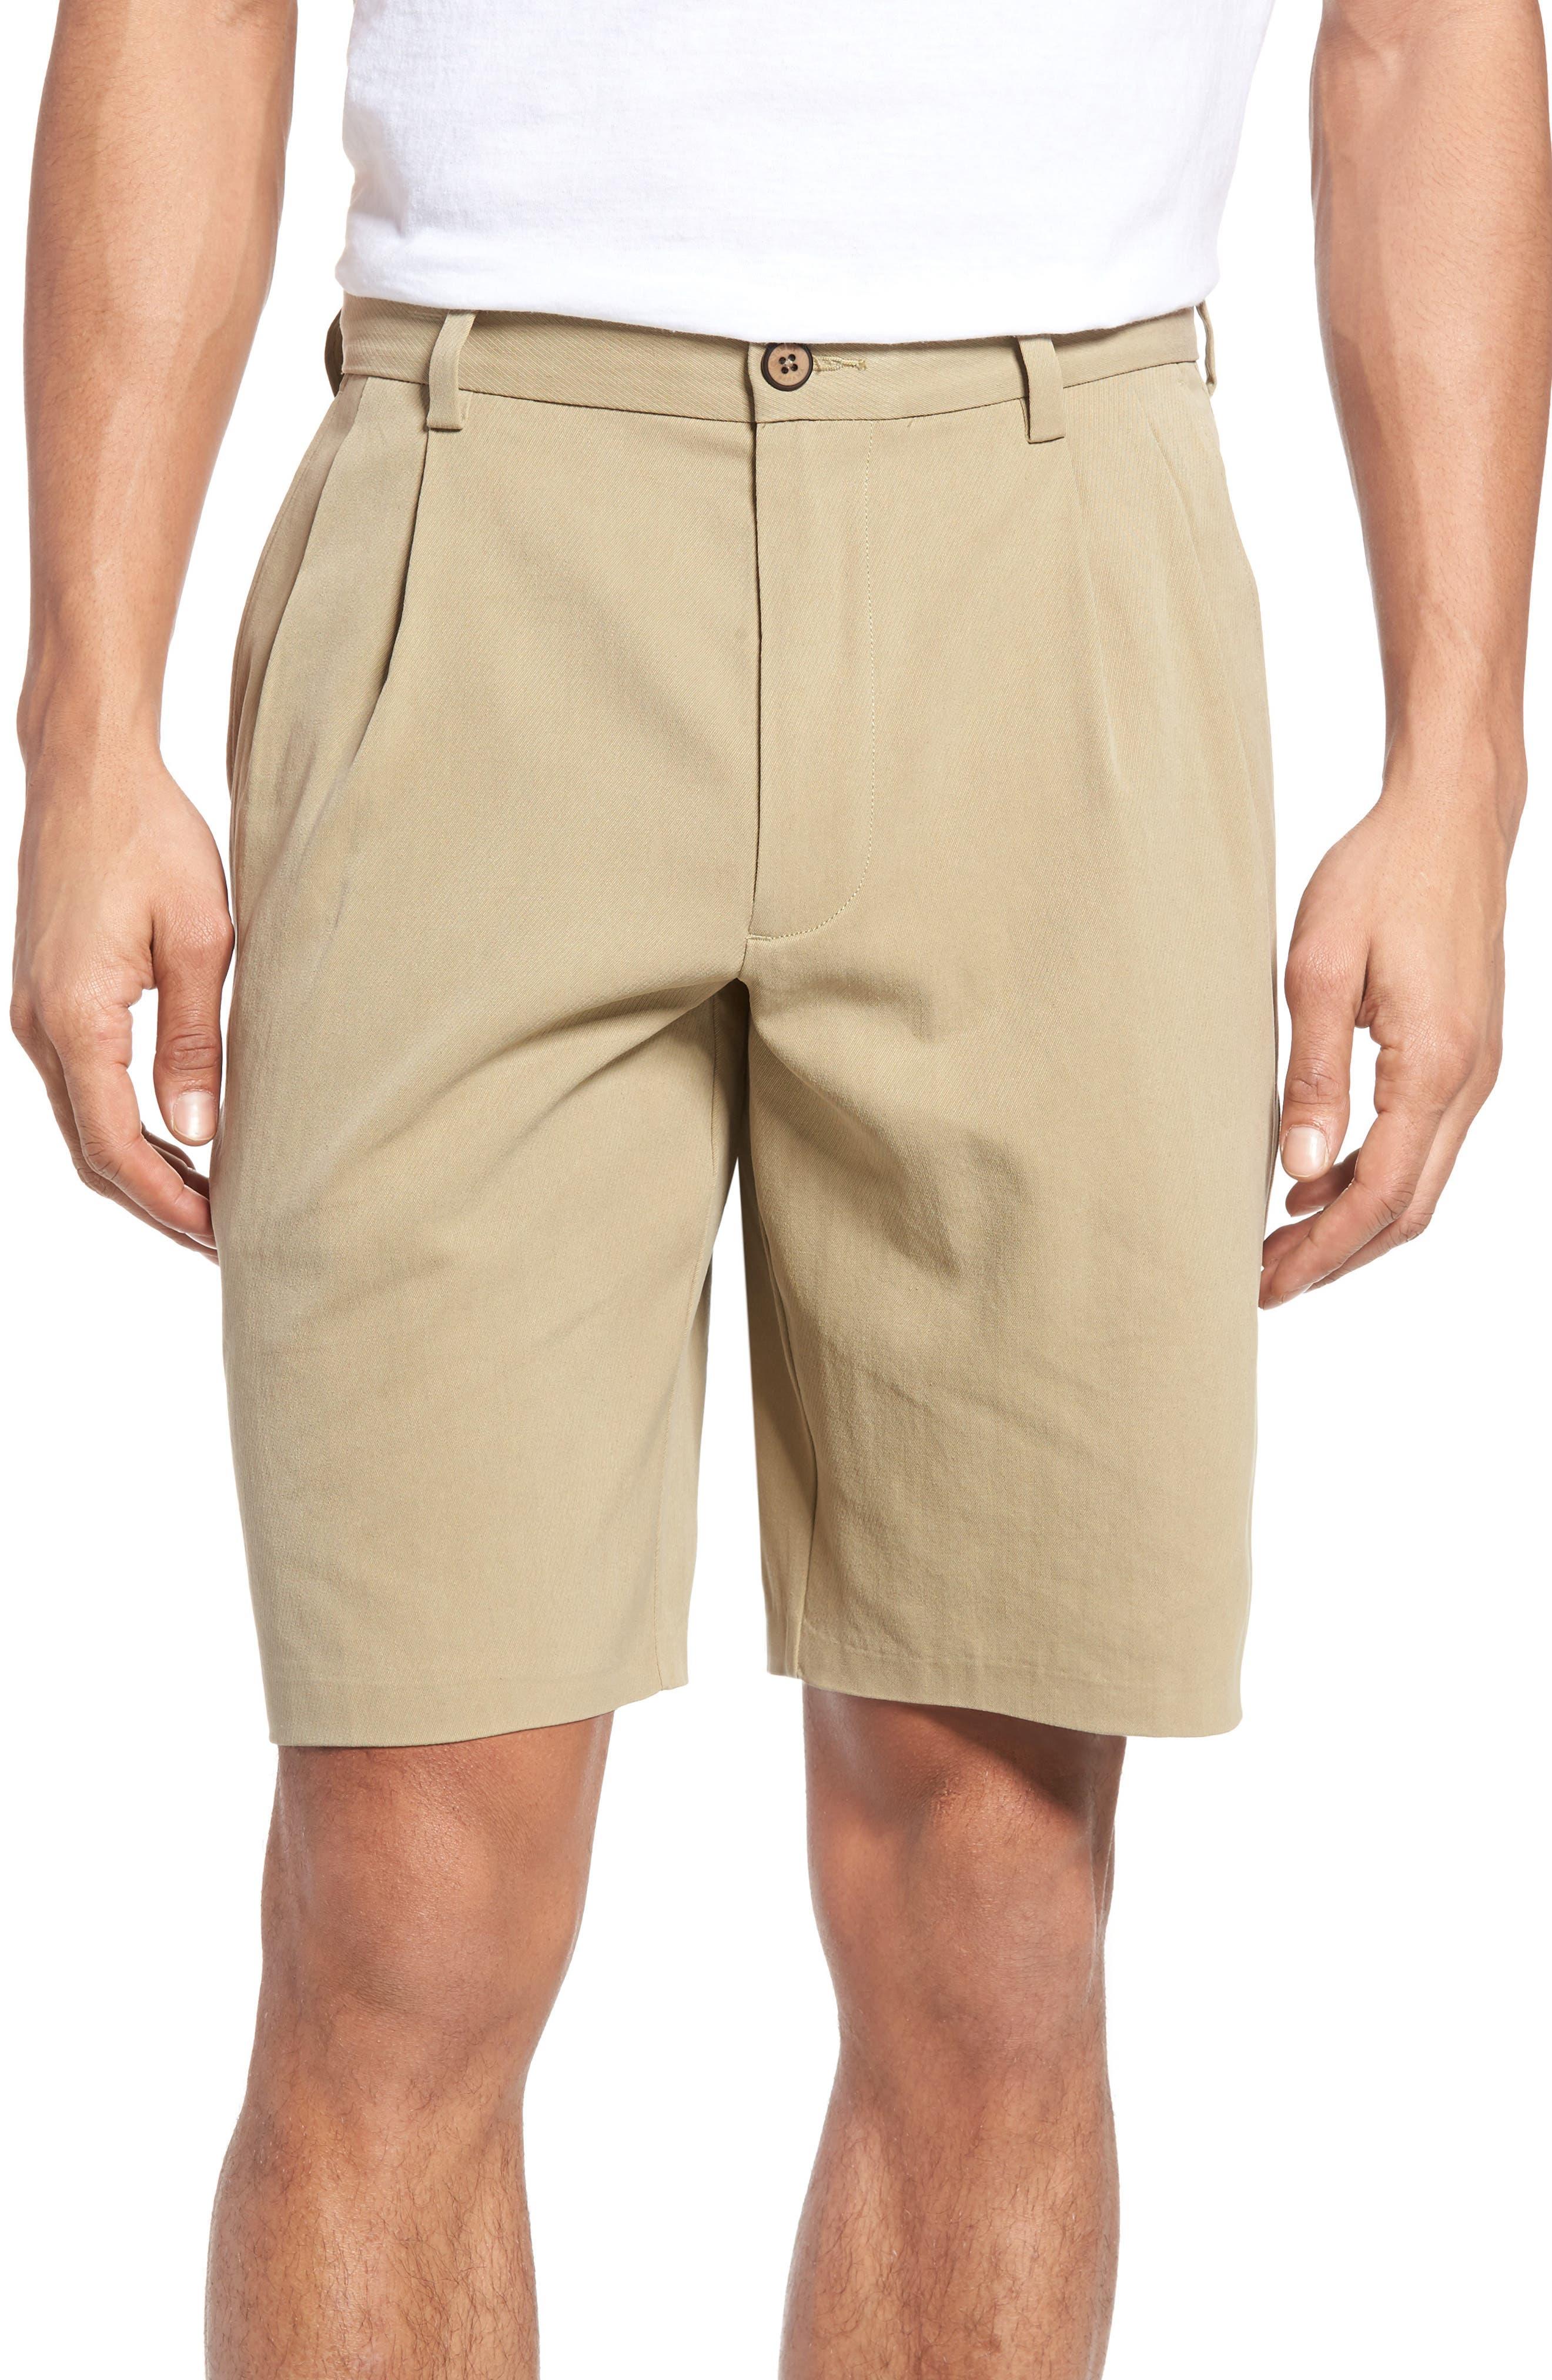 St. Thomas Pleated Shorts,                             Main thumbnail 6, color,